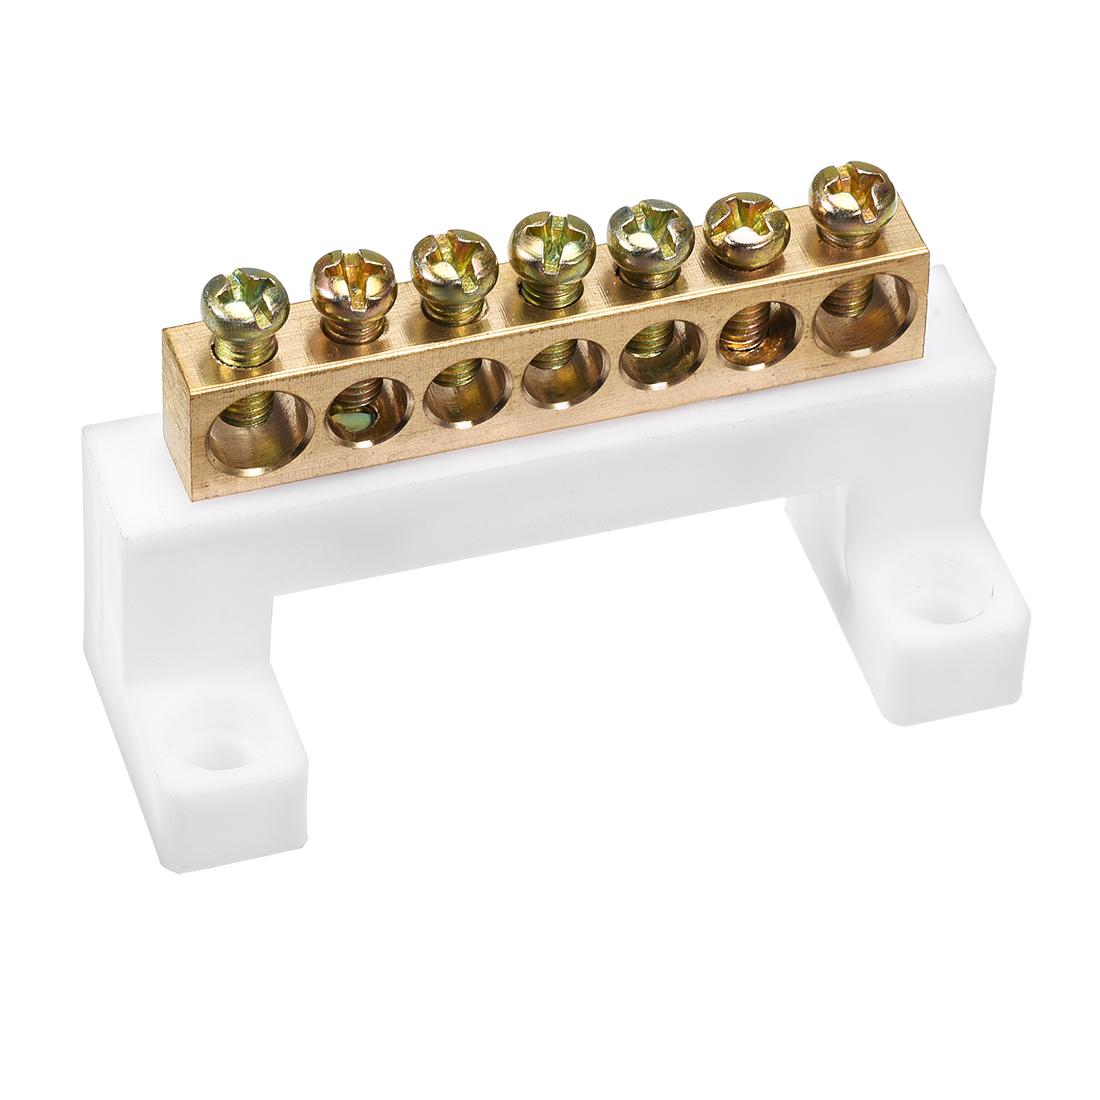 Copper Screw Terminal Block Bar 100A Double Row Bridge Shape 7 Positions